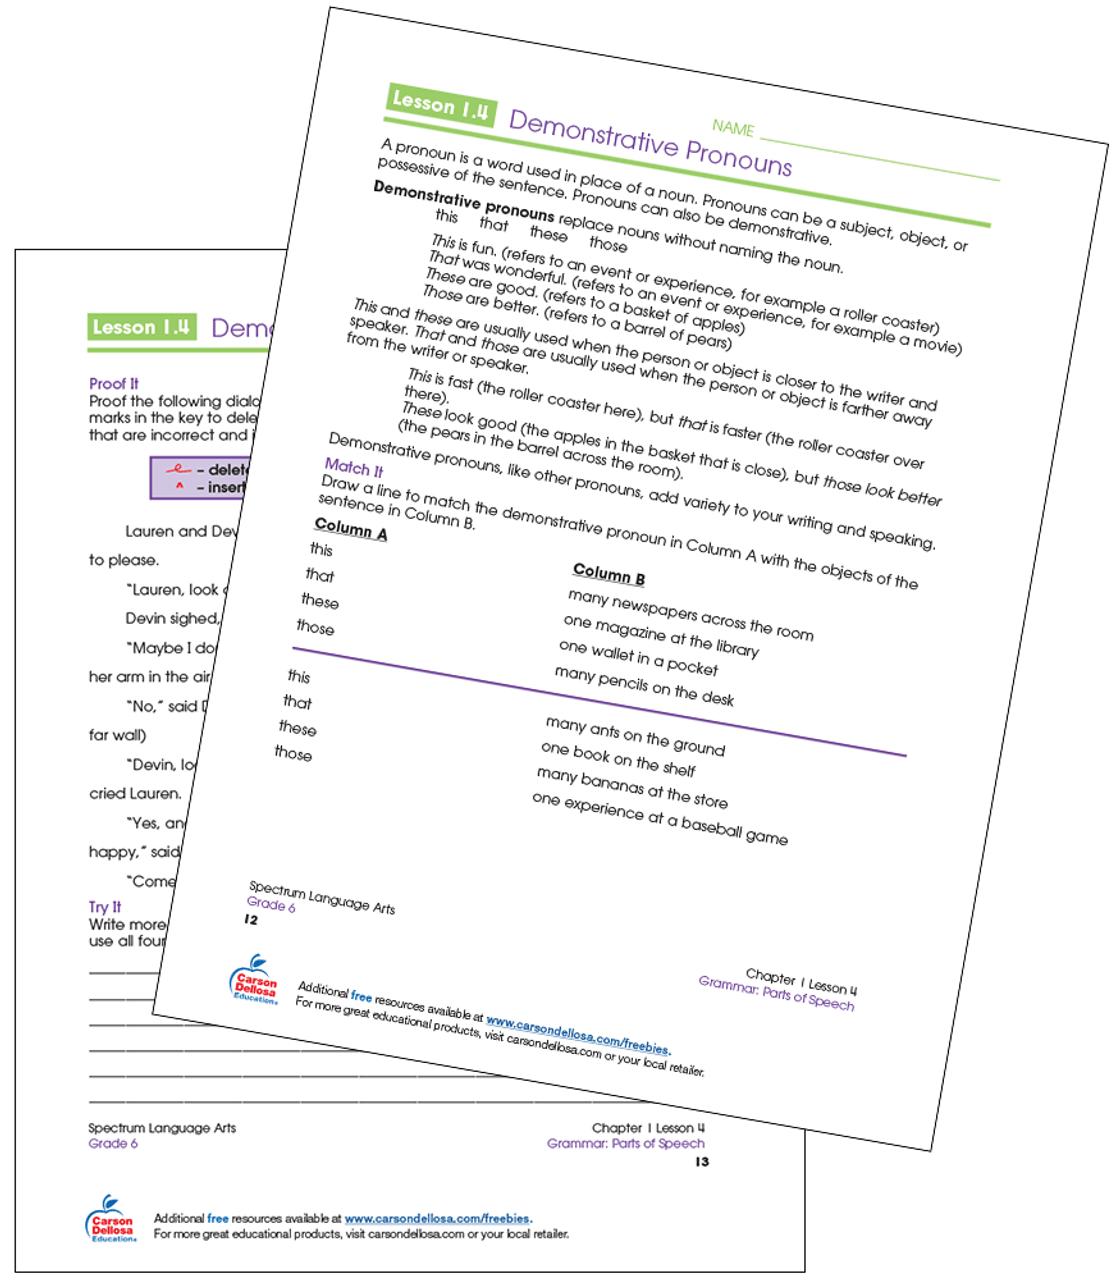 Demonstrative Pronouns Grade 6 Free Printable   Carson Dellosa [ 1280 x 1120 Pixel ]